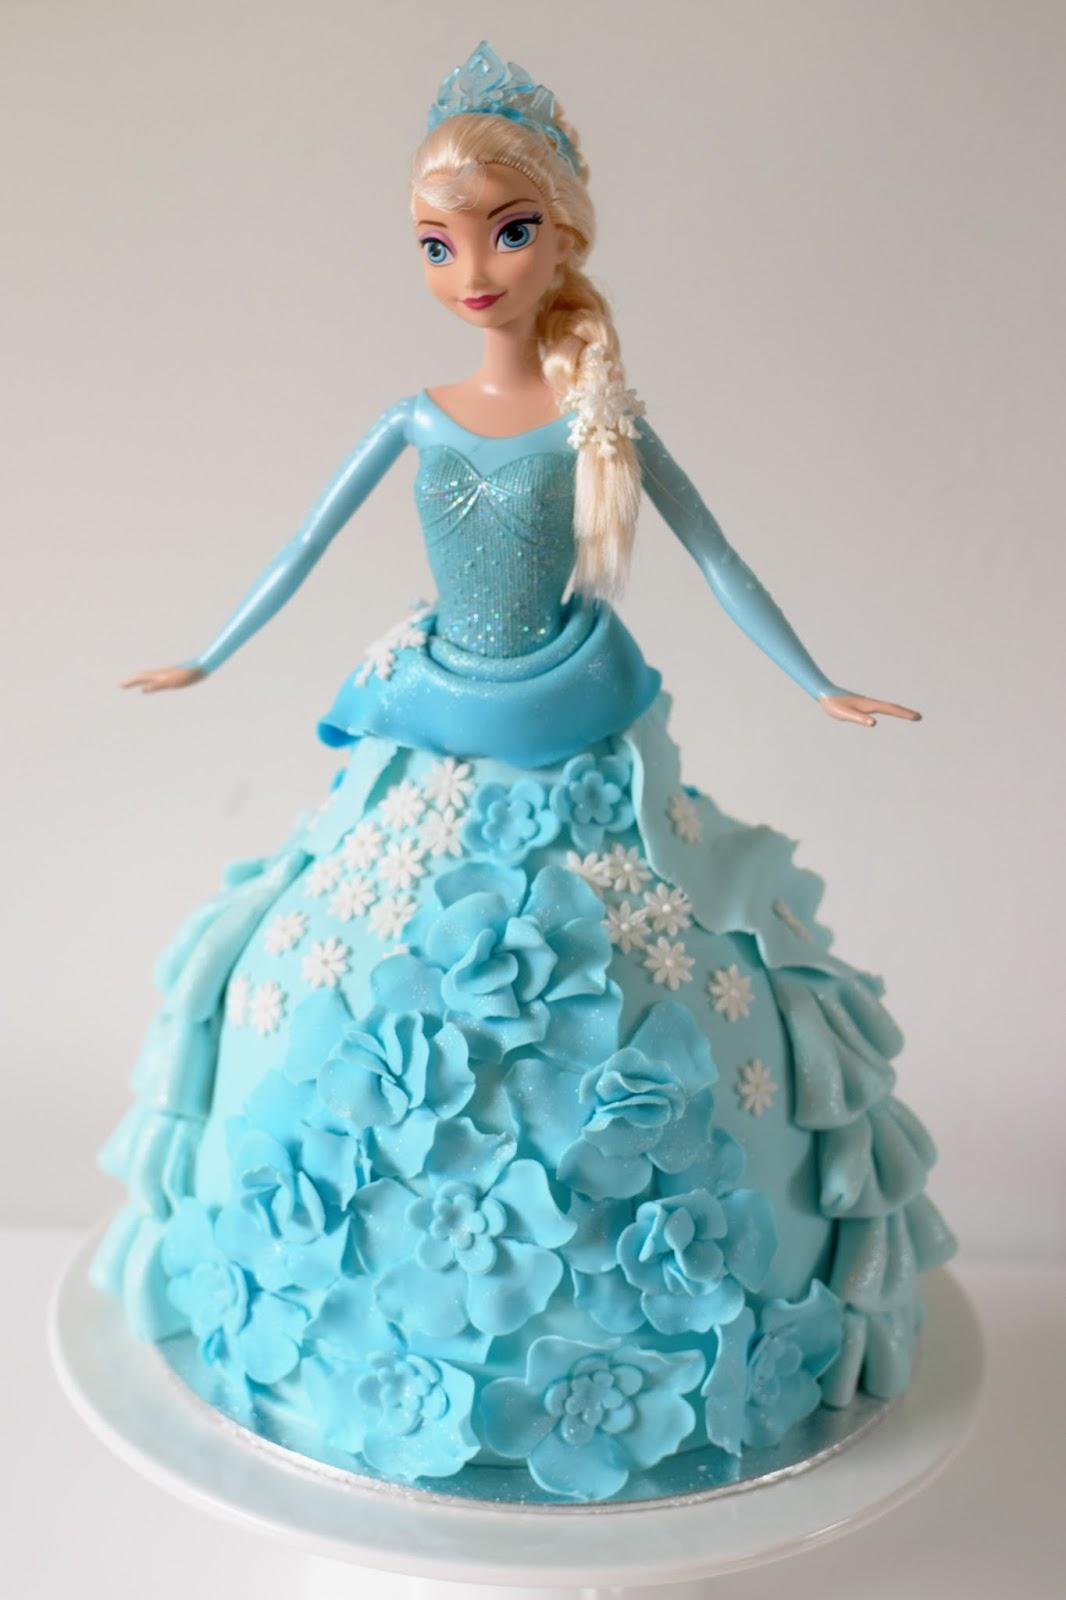 Elsa Doll Cake Images : Fijne Pret: Elsa Doll Cake